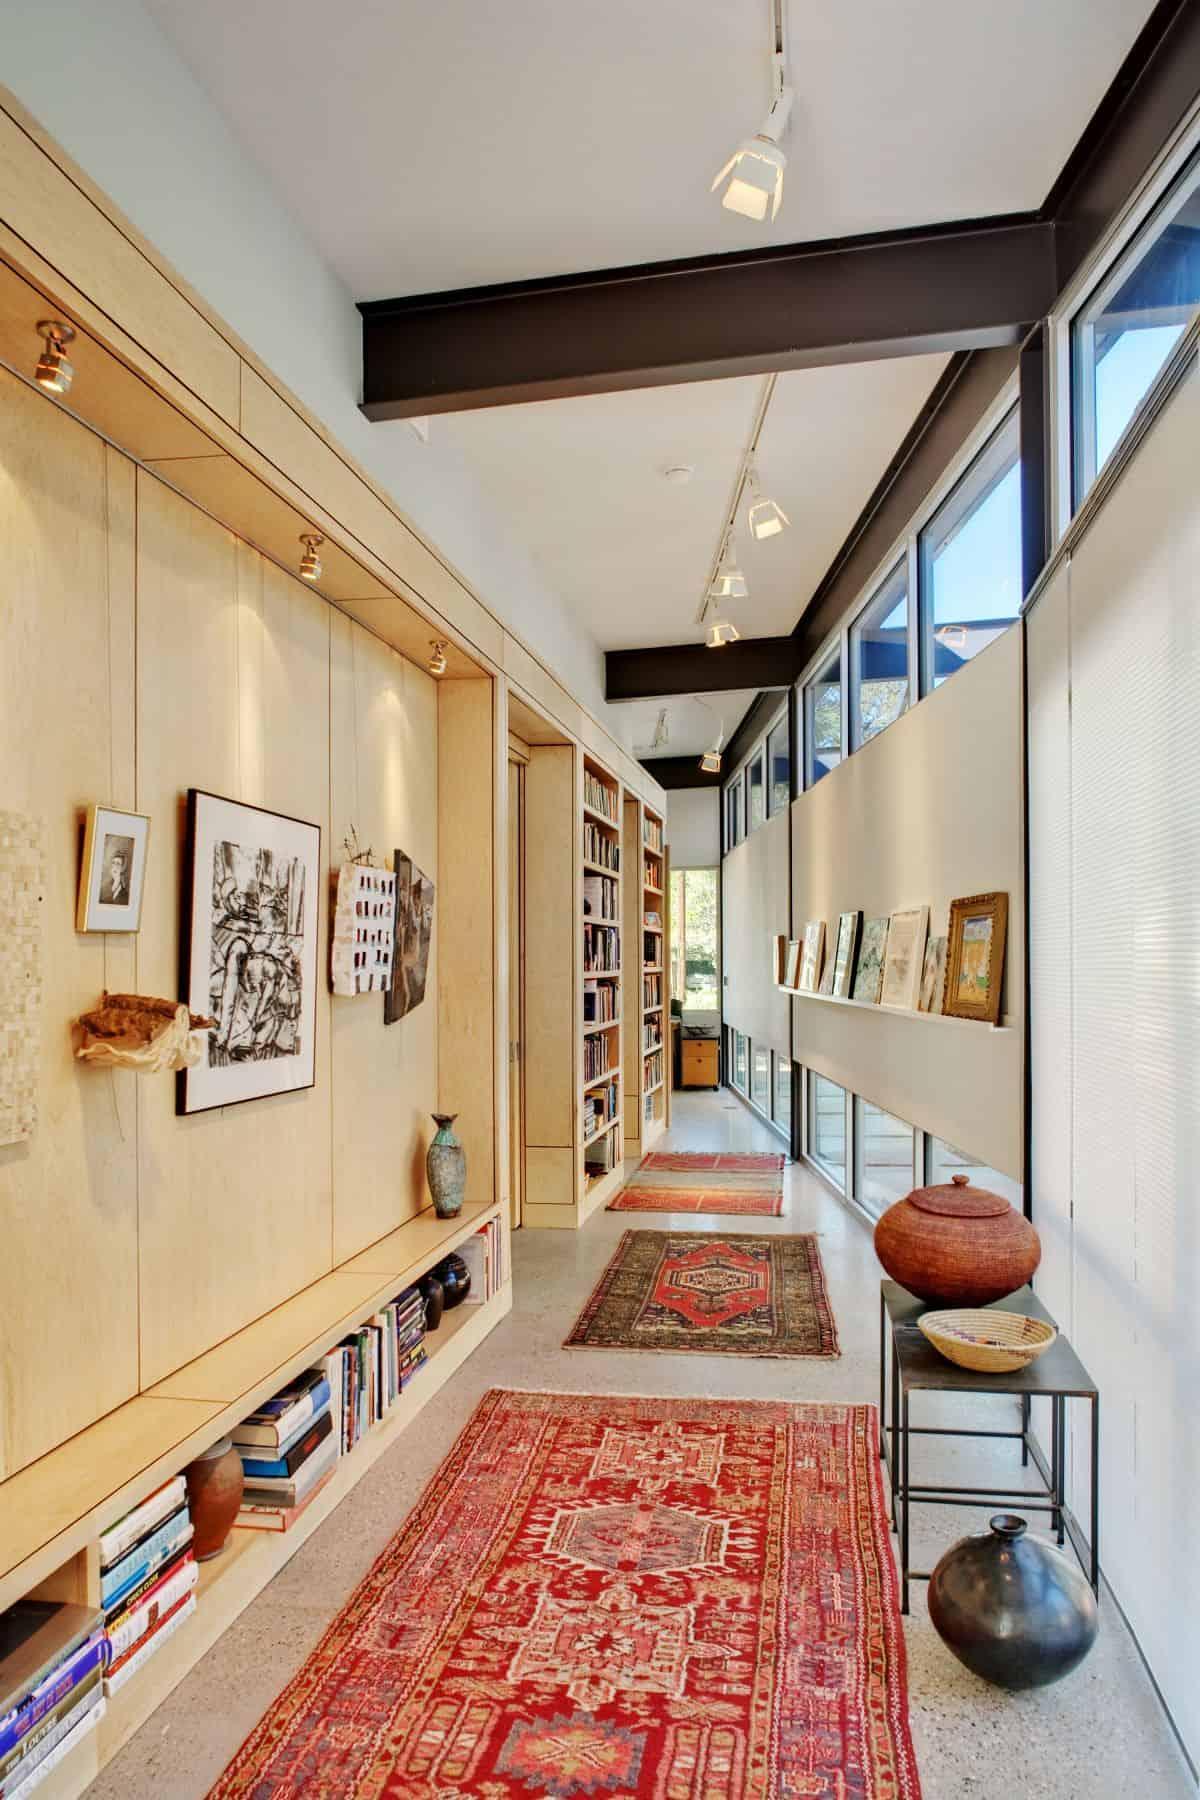 Stylishly Simple Modern One Story House Design | Modern ... on Modern House Ideas  id=95310